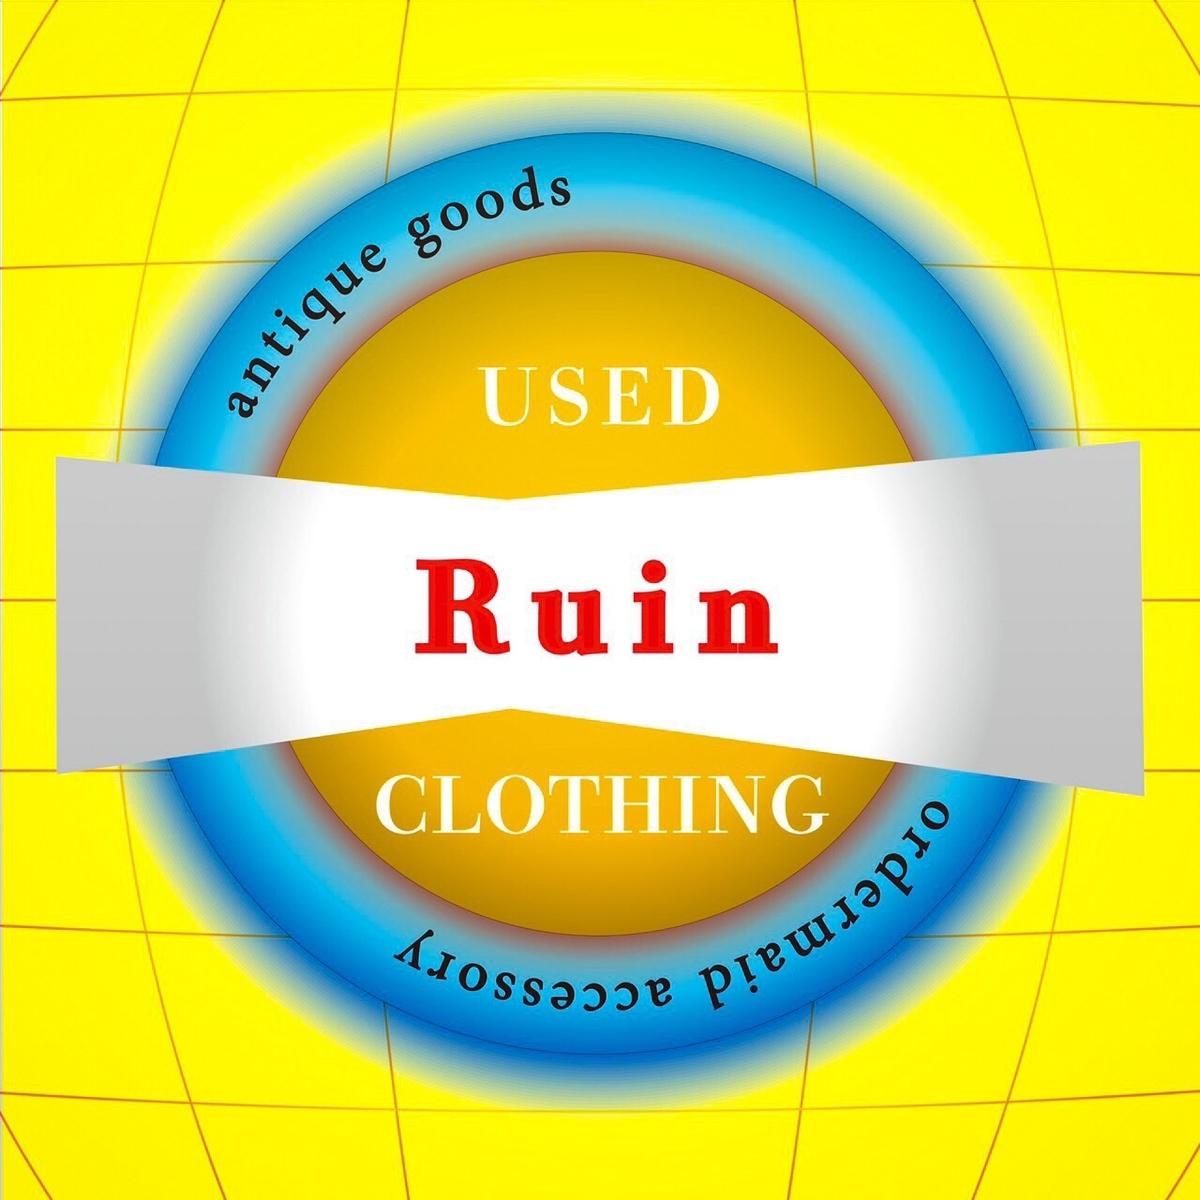 f:id:ruin-selectshop:20191114172602j:plain